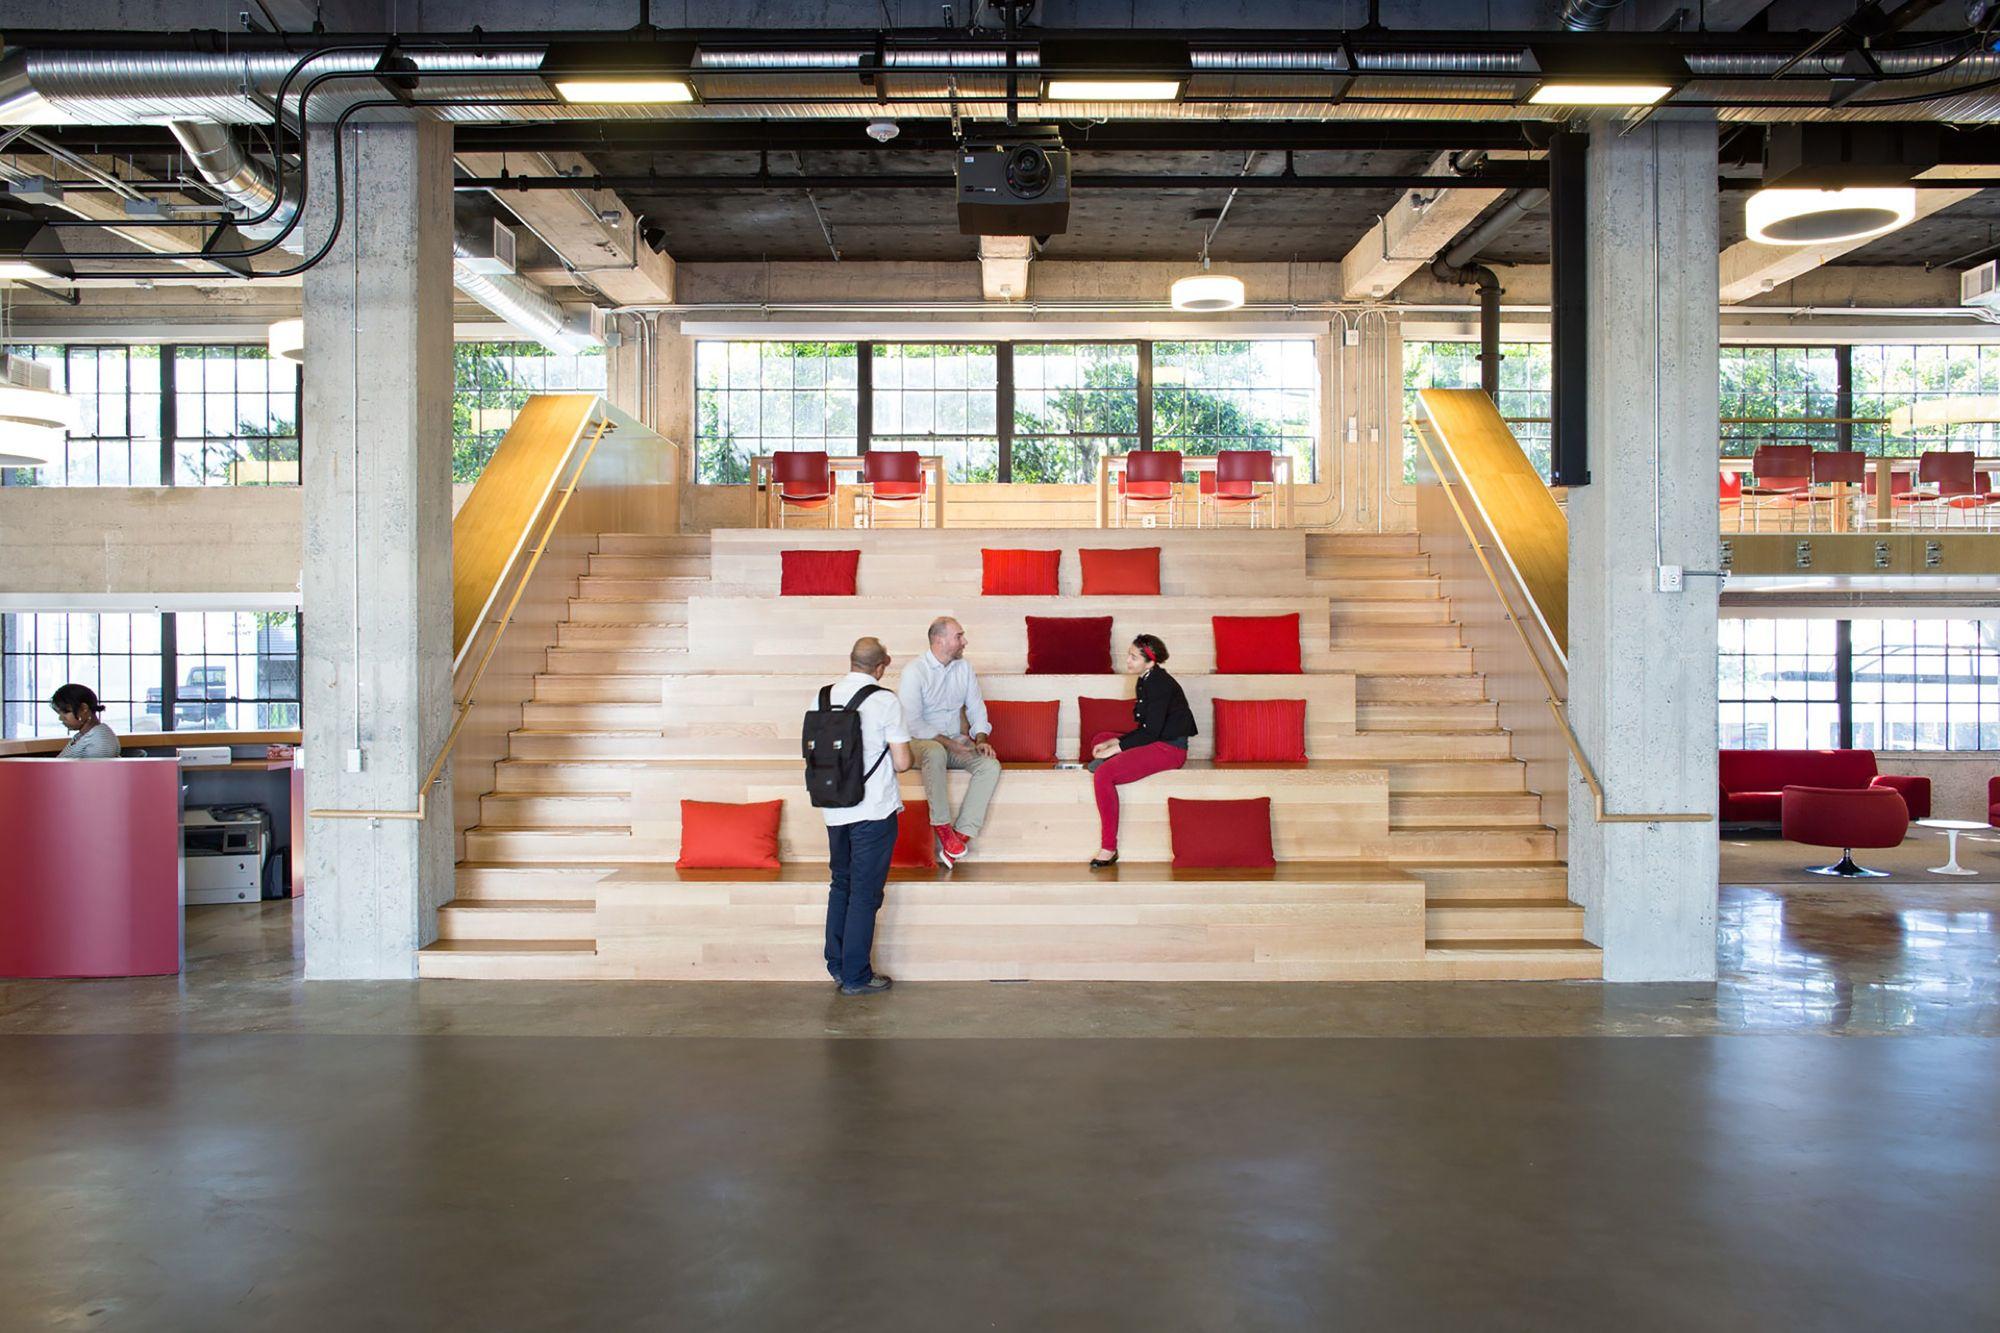 Gallery Of Pch International Innovation Hub Chrdauer Architects